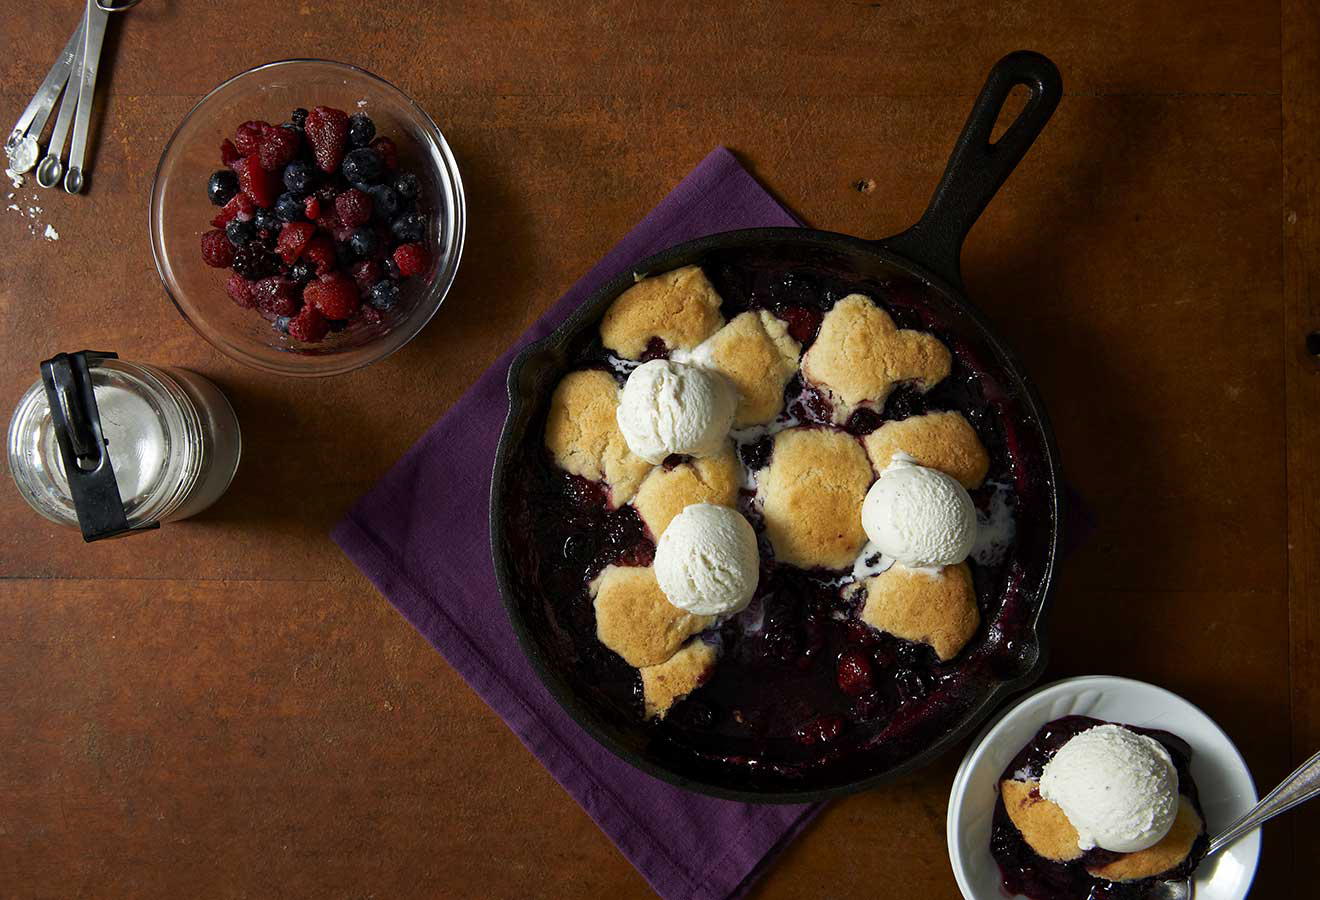 Vanilla ice cream and berry cobbler